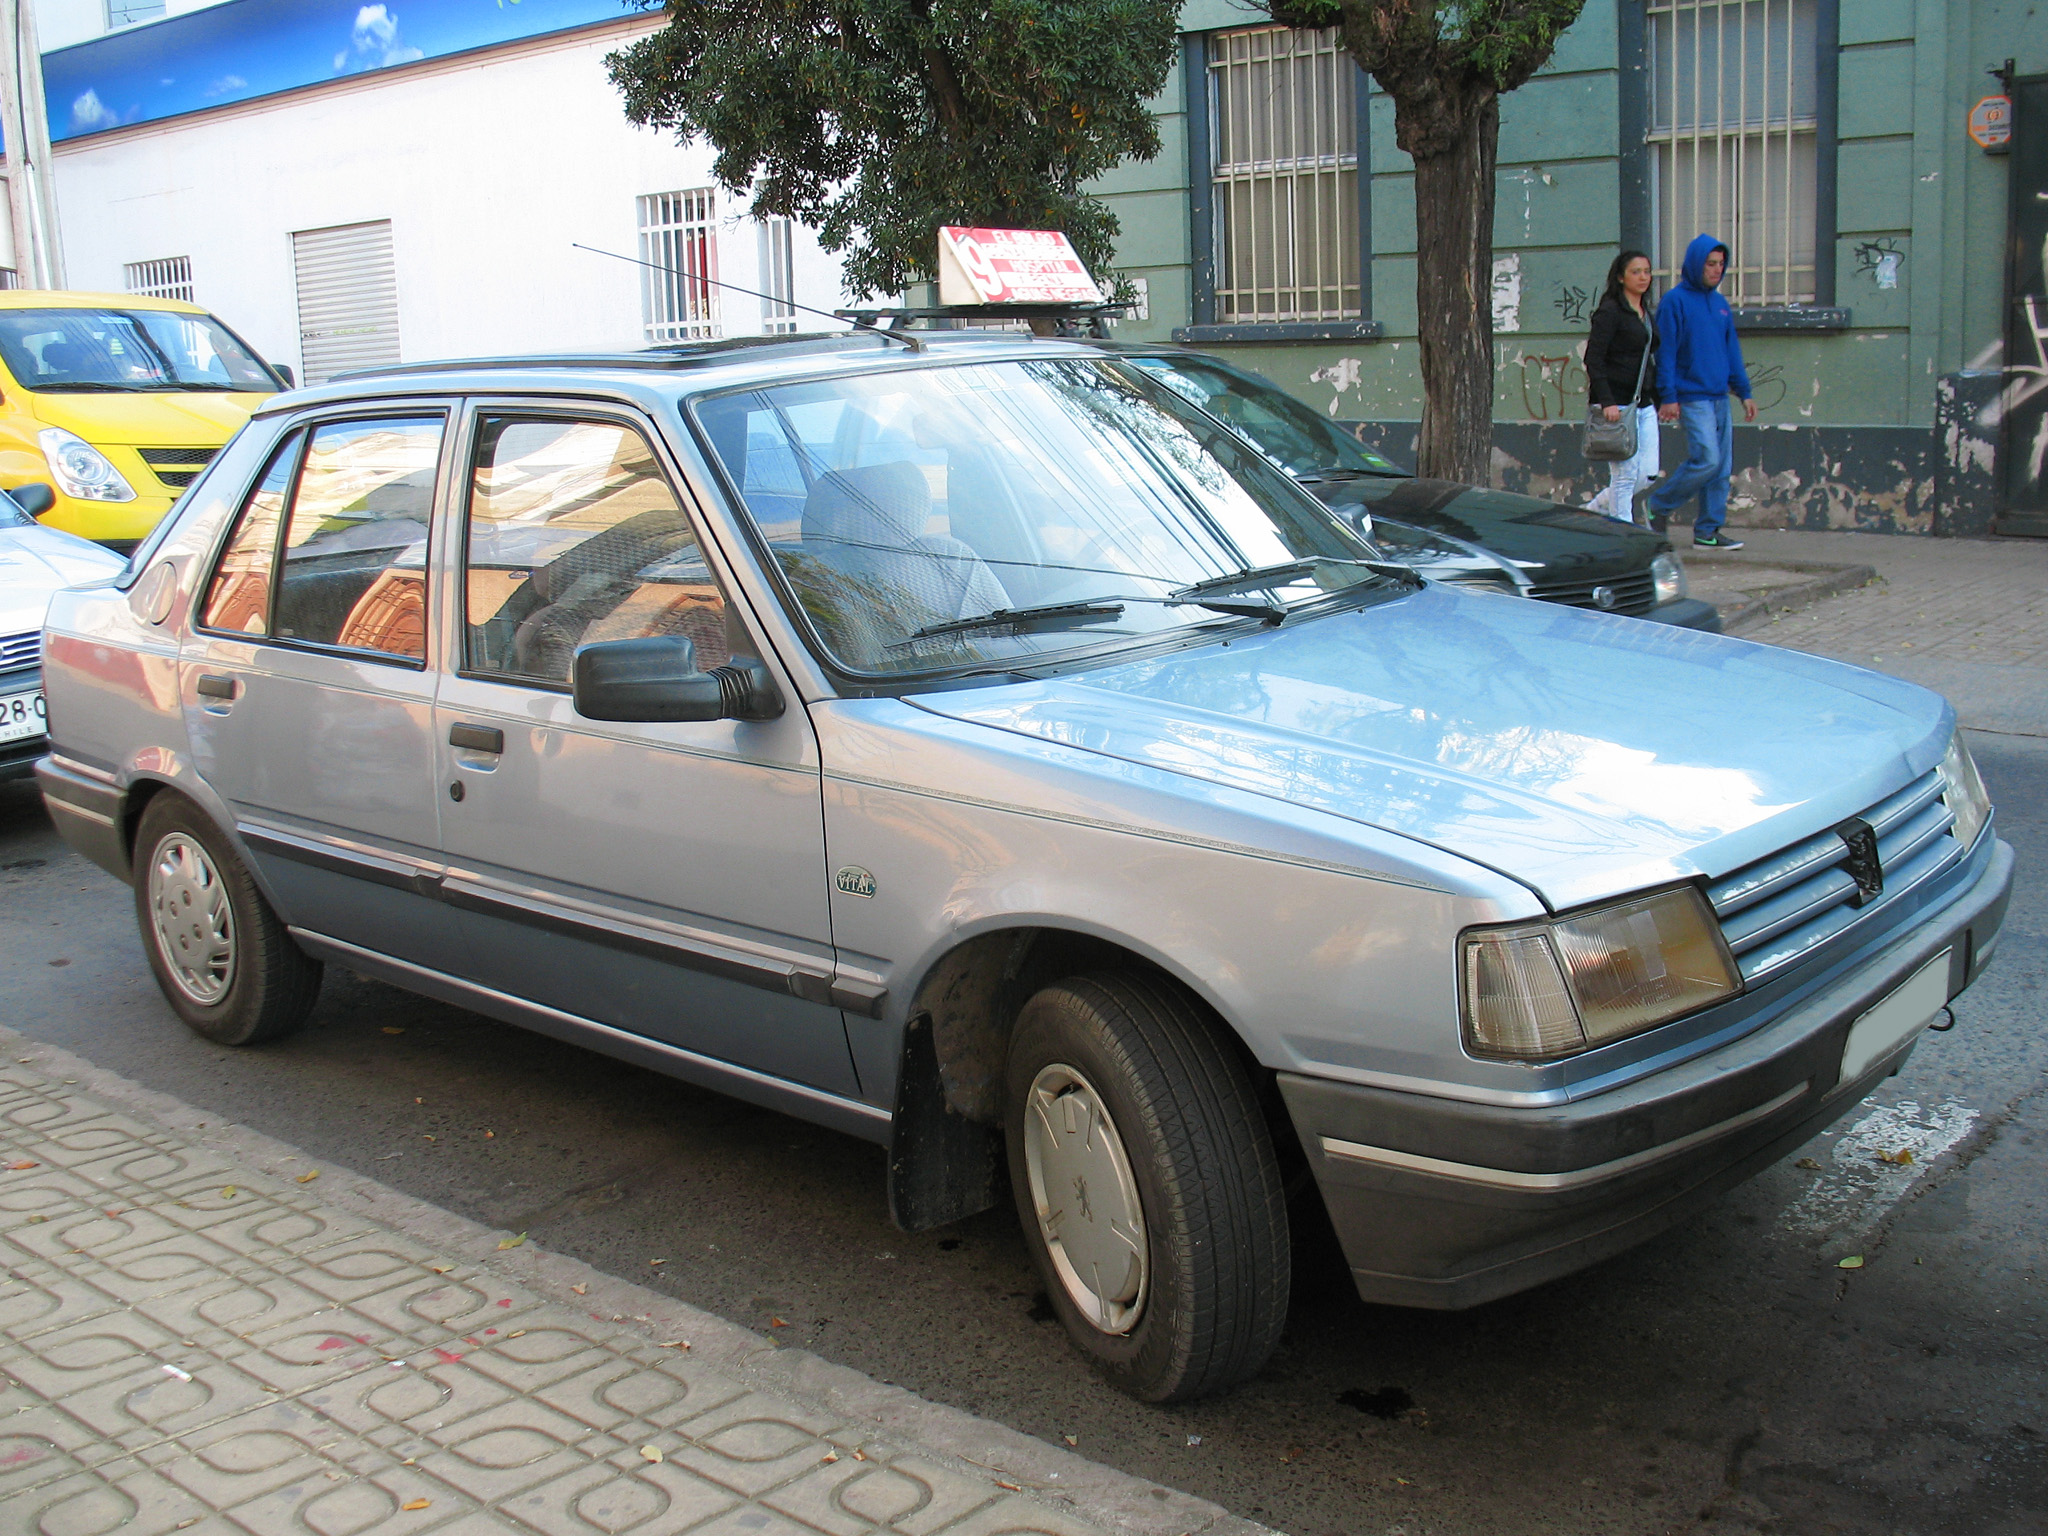 File Peugeot 309 Gli Vital 1993 15099457586 Jpg Wikimedia Commons